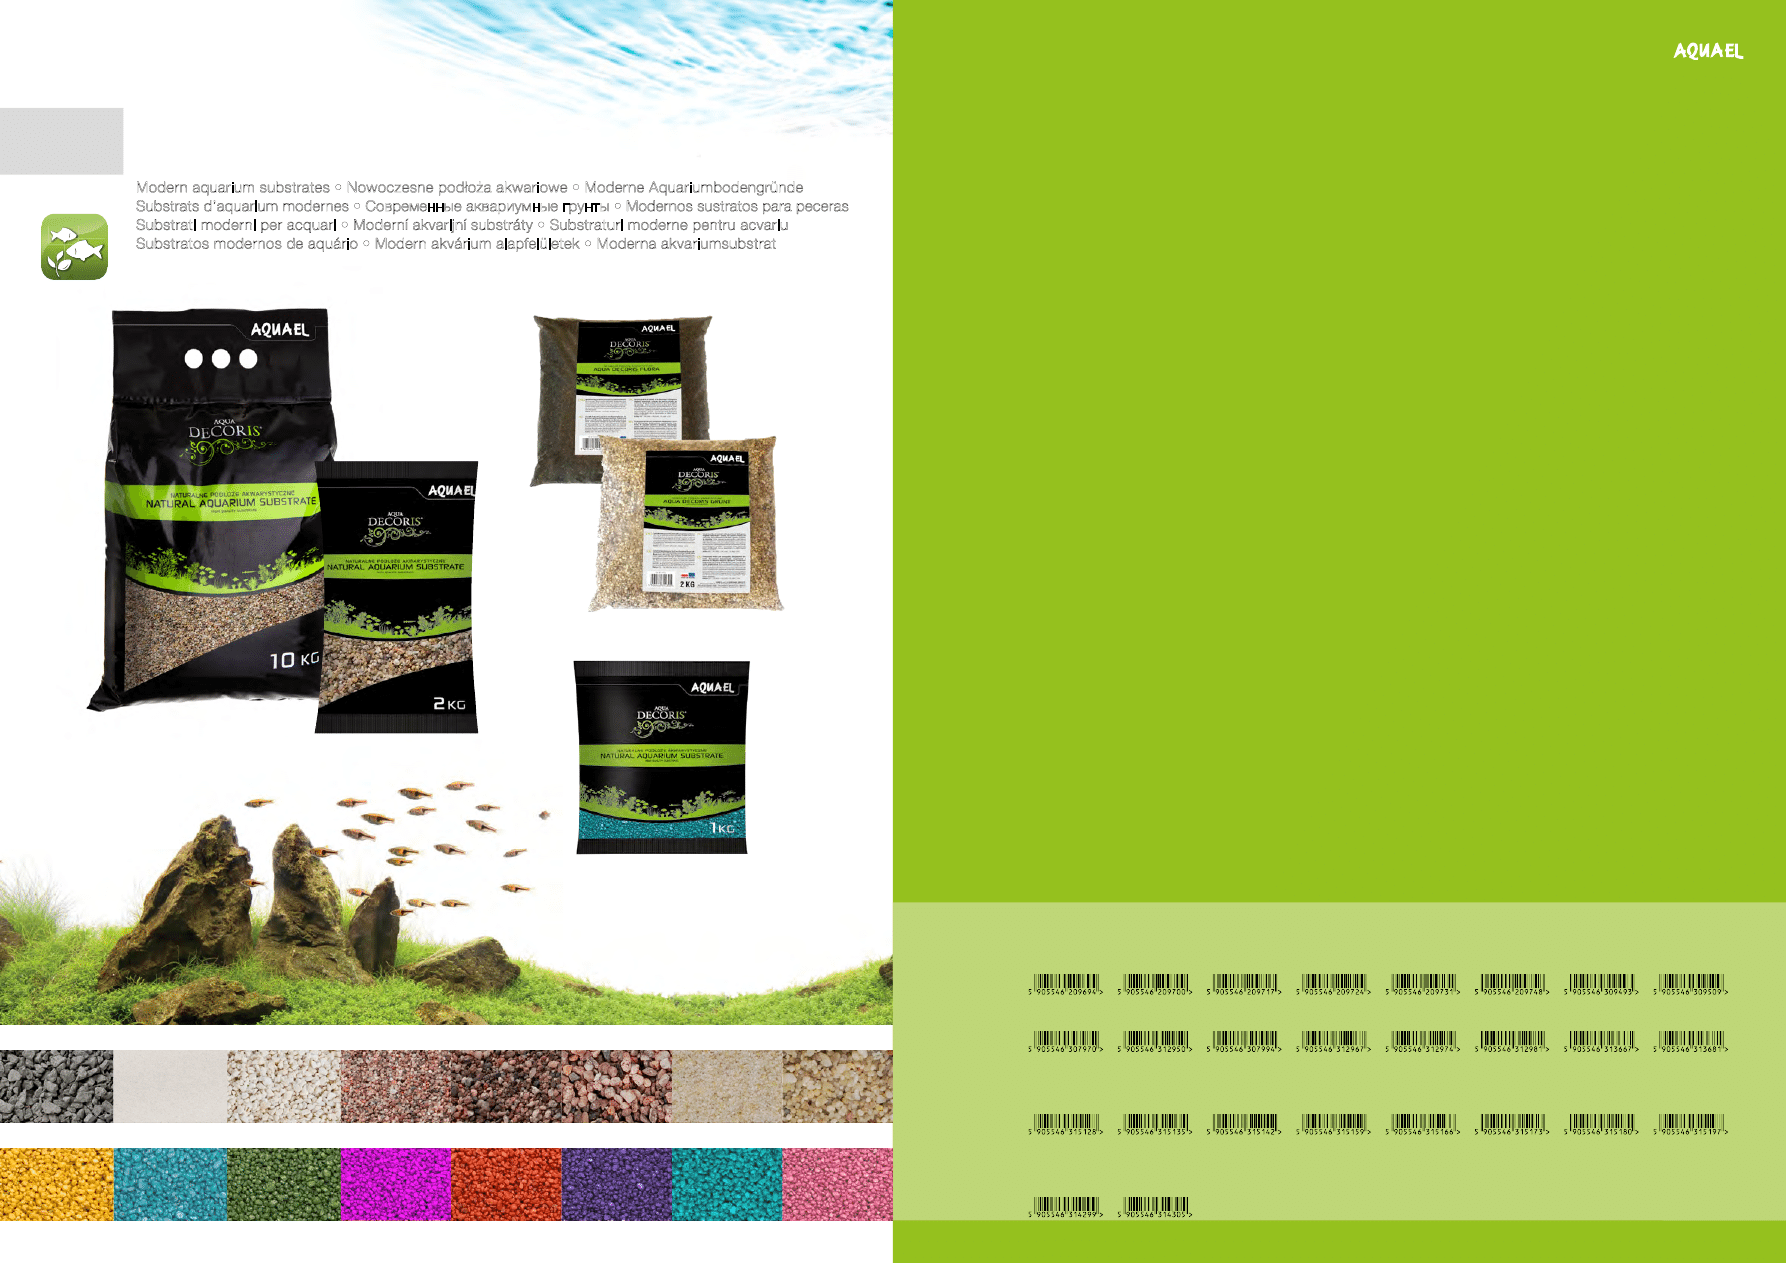 Pet Supplies Adaptable Aquael Basalt Gravel 2-4mm 2kg Fish & Aquariums Moderate Price